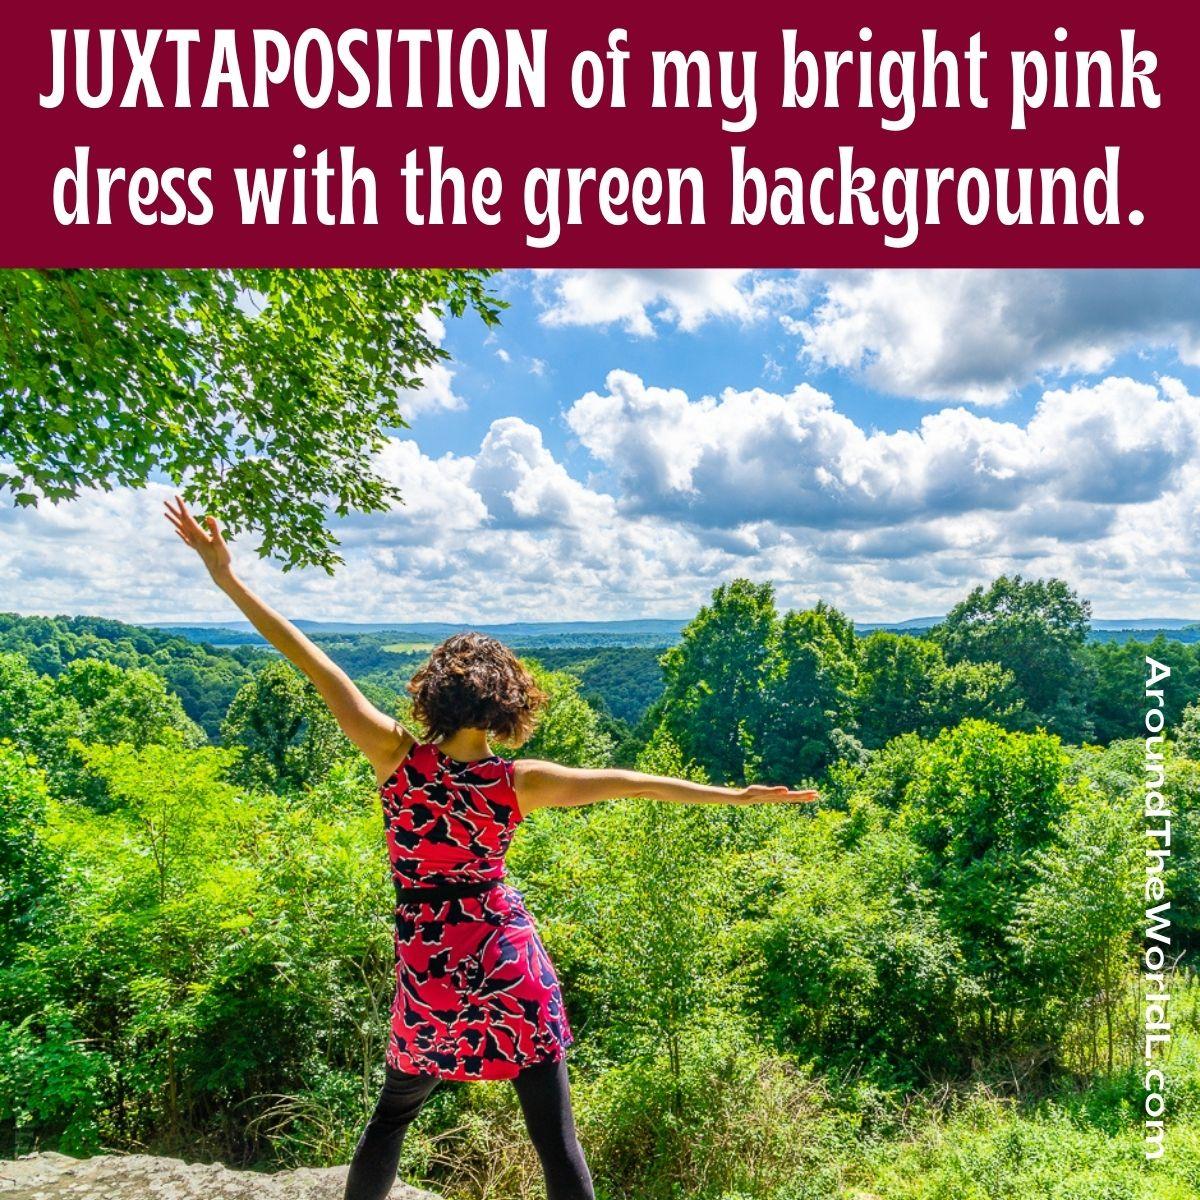 Juxtaposition photography